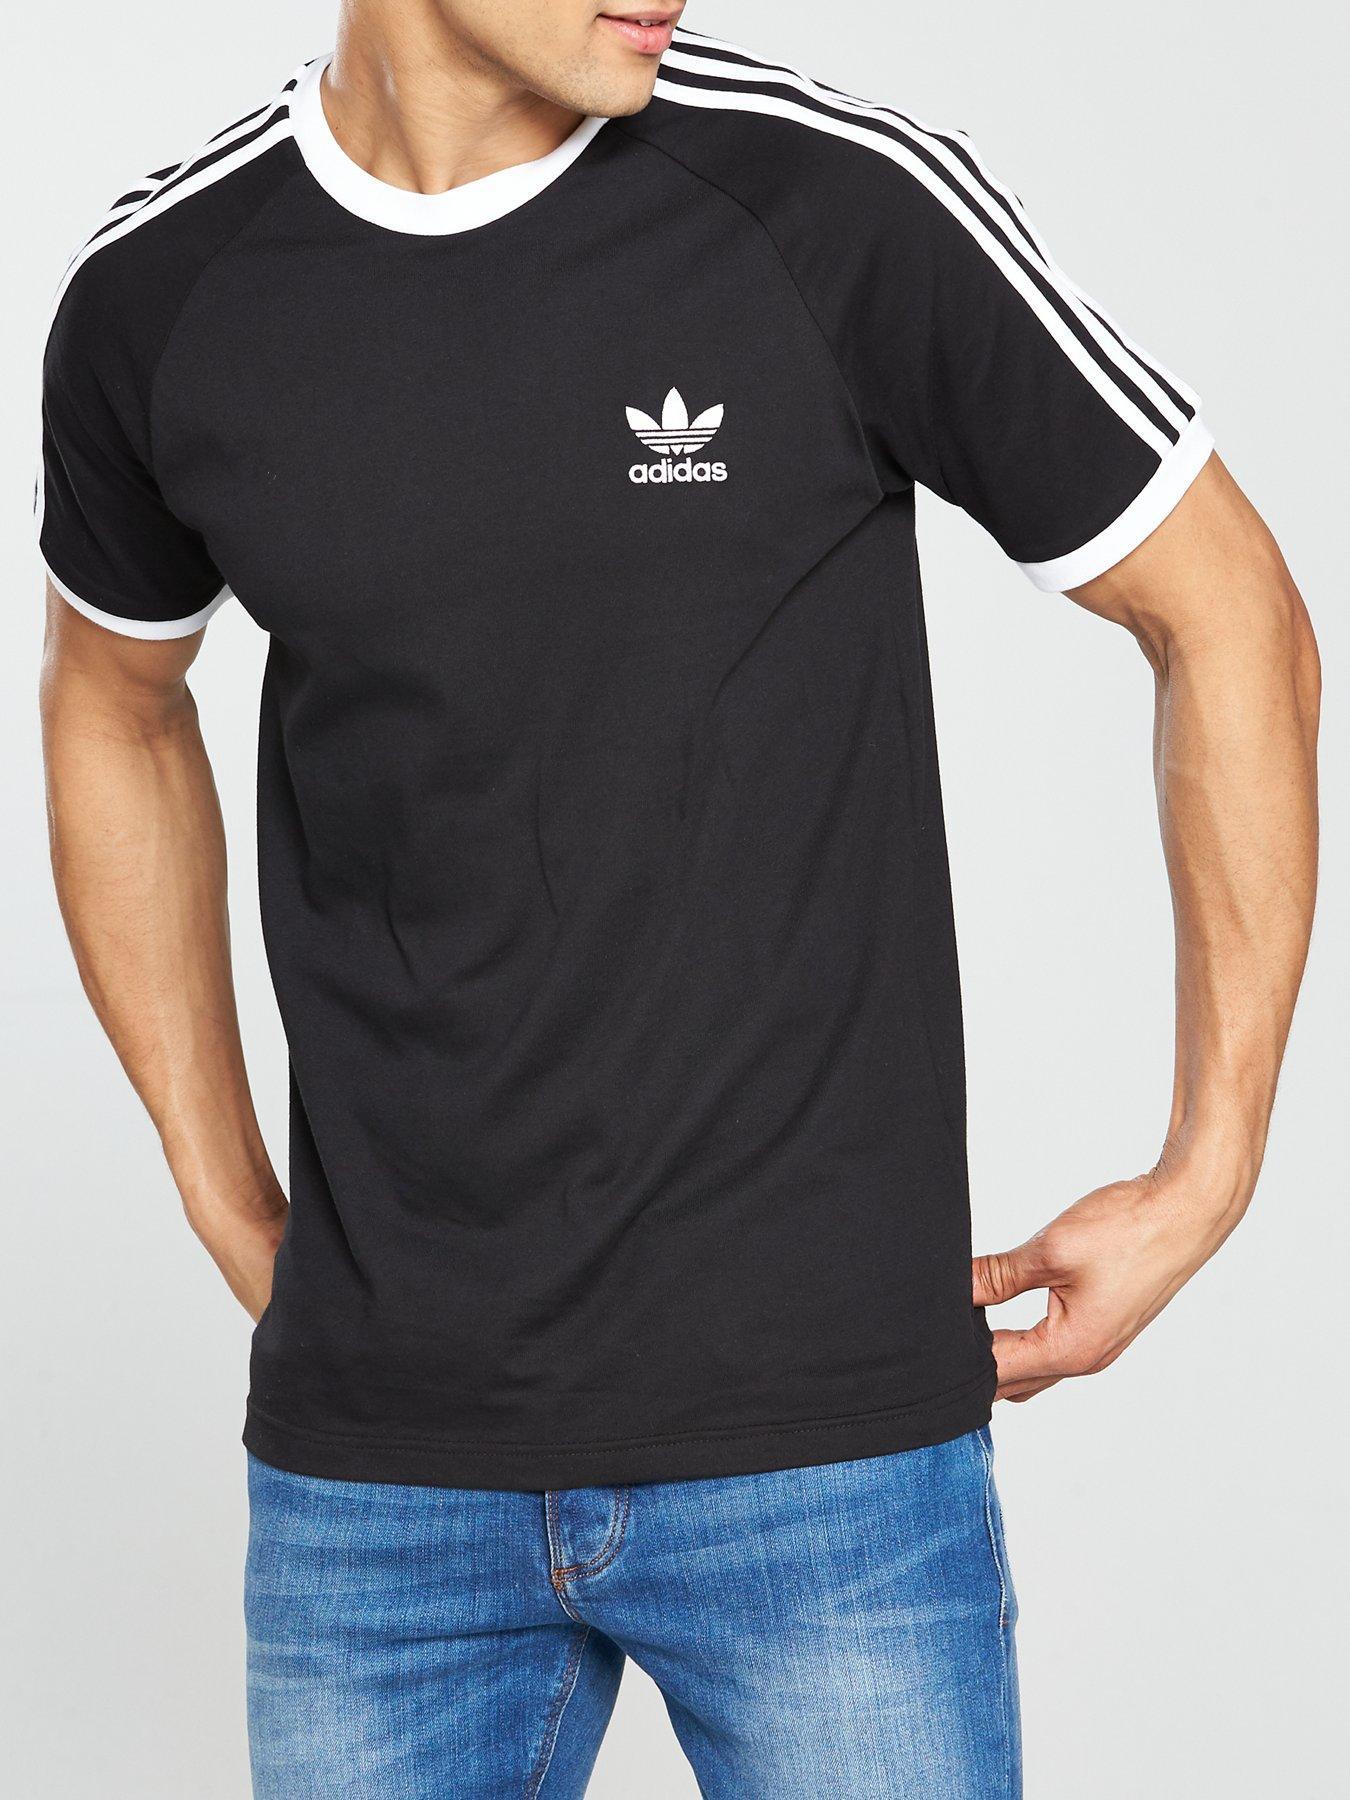 adidas california t shirt